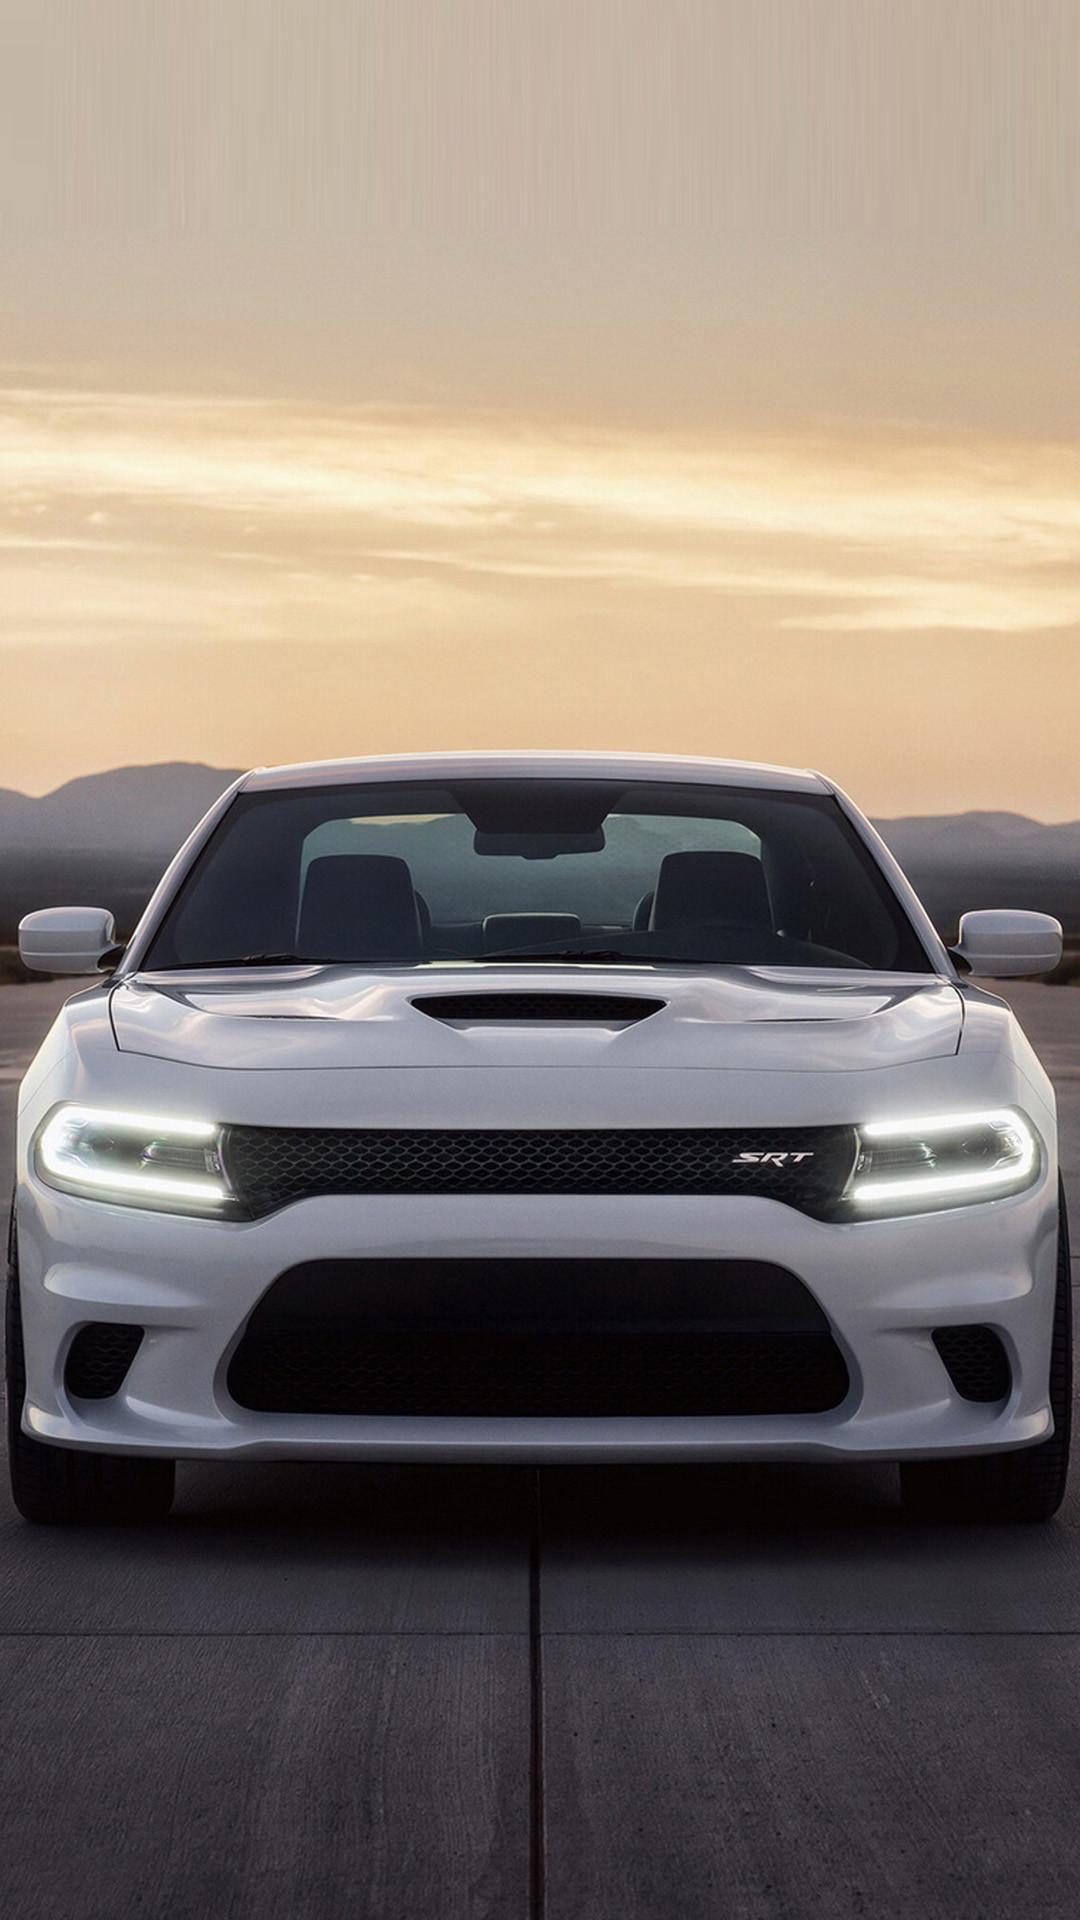 Dodge Challenger Iphone Wallpaper 86 Images